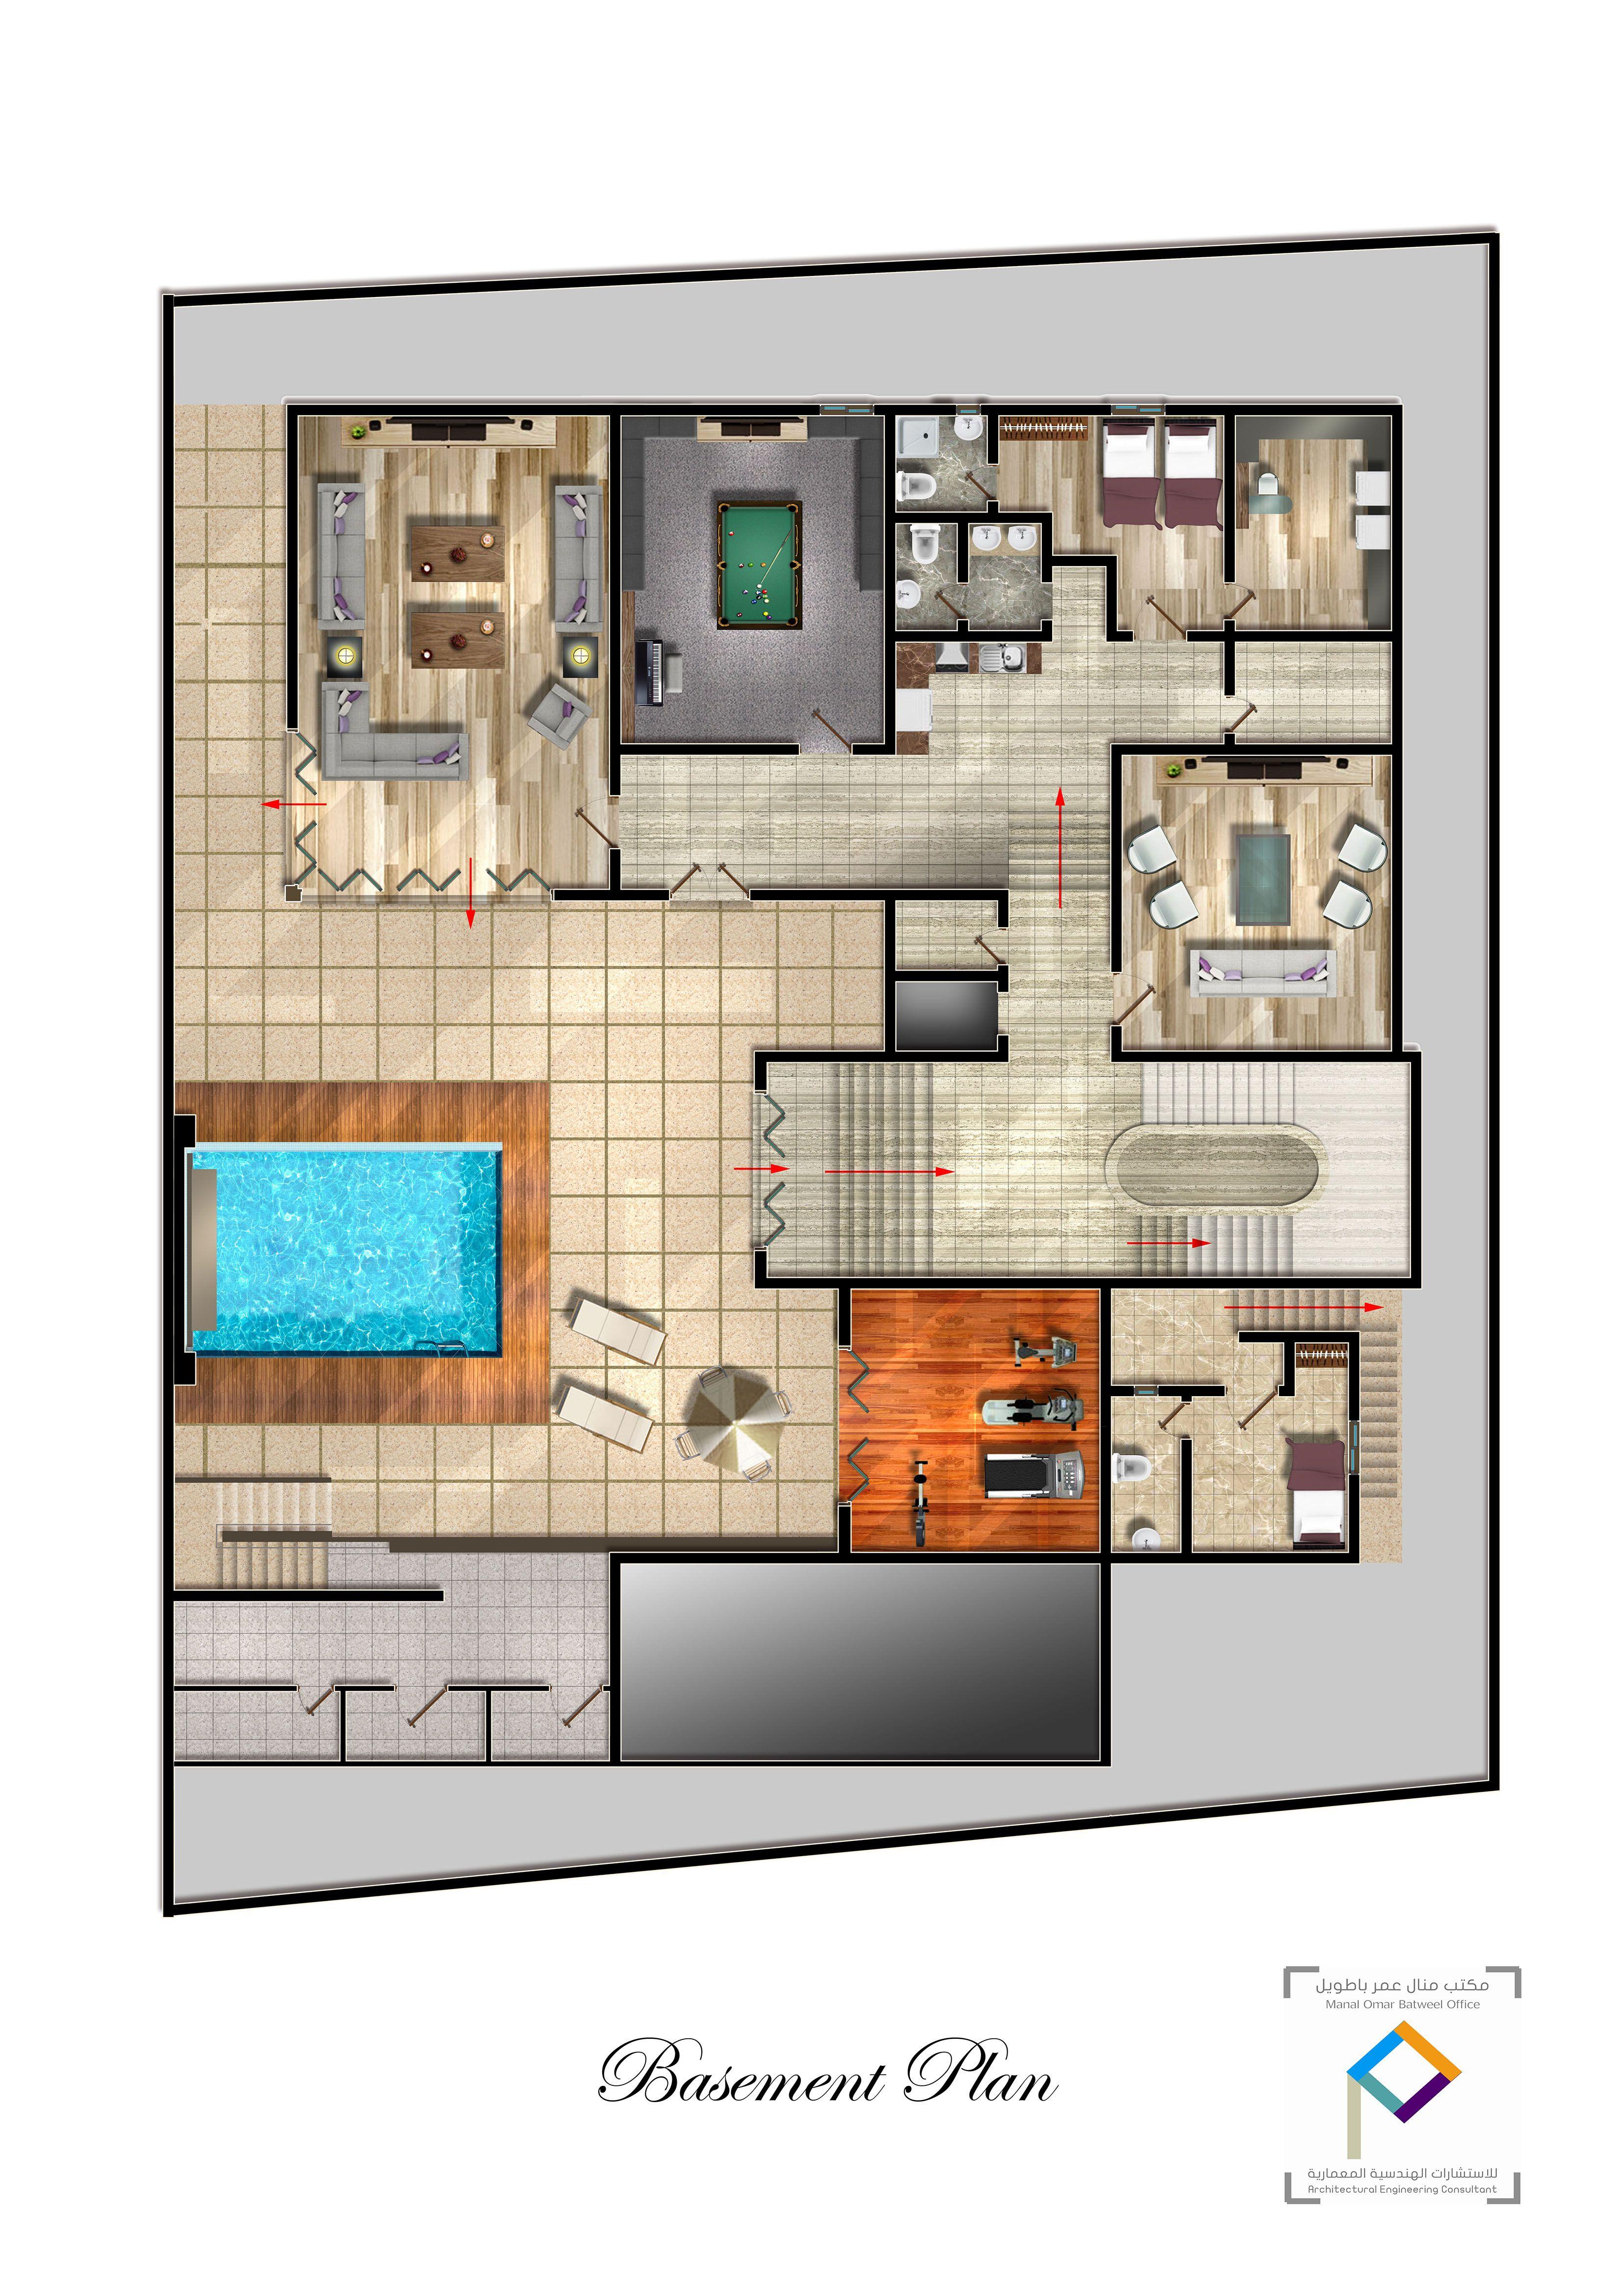 Basement Floor Plan Swimming Pool แปลนบ าน